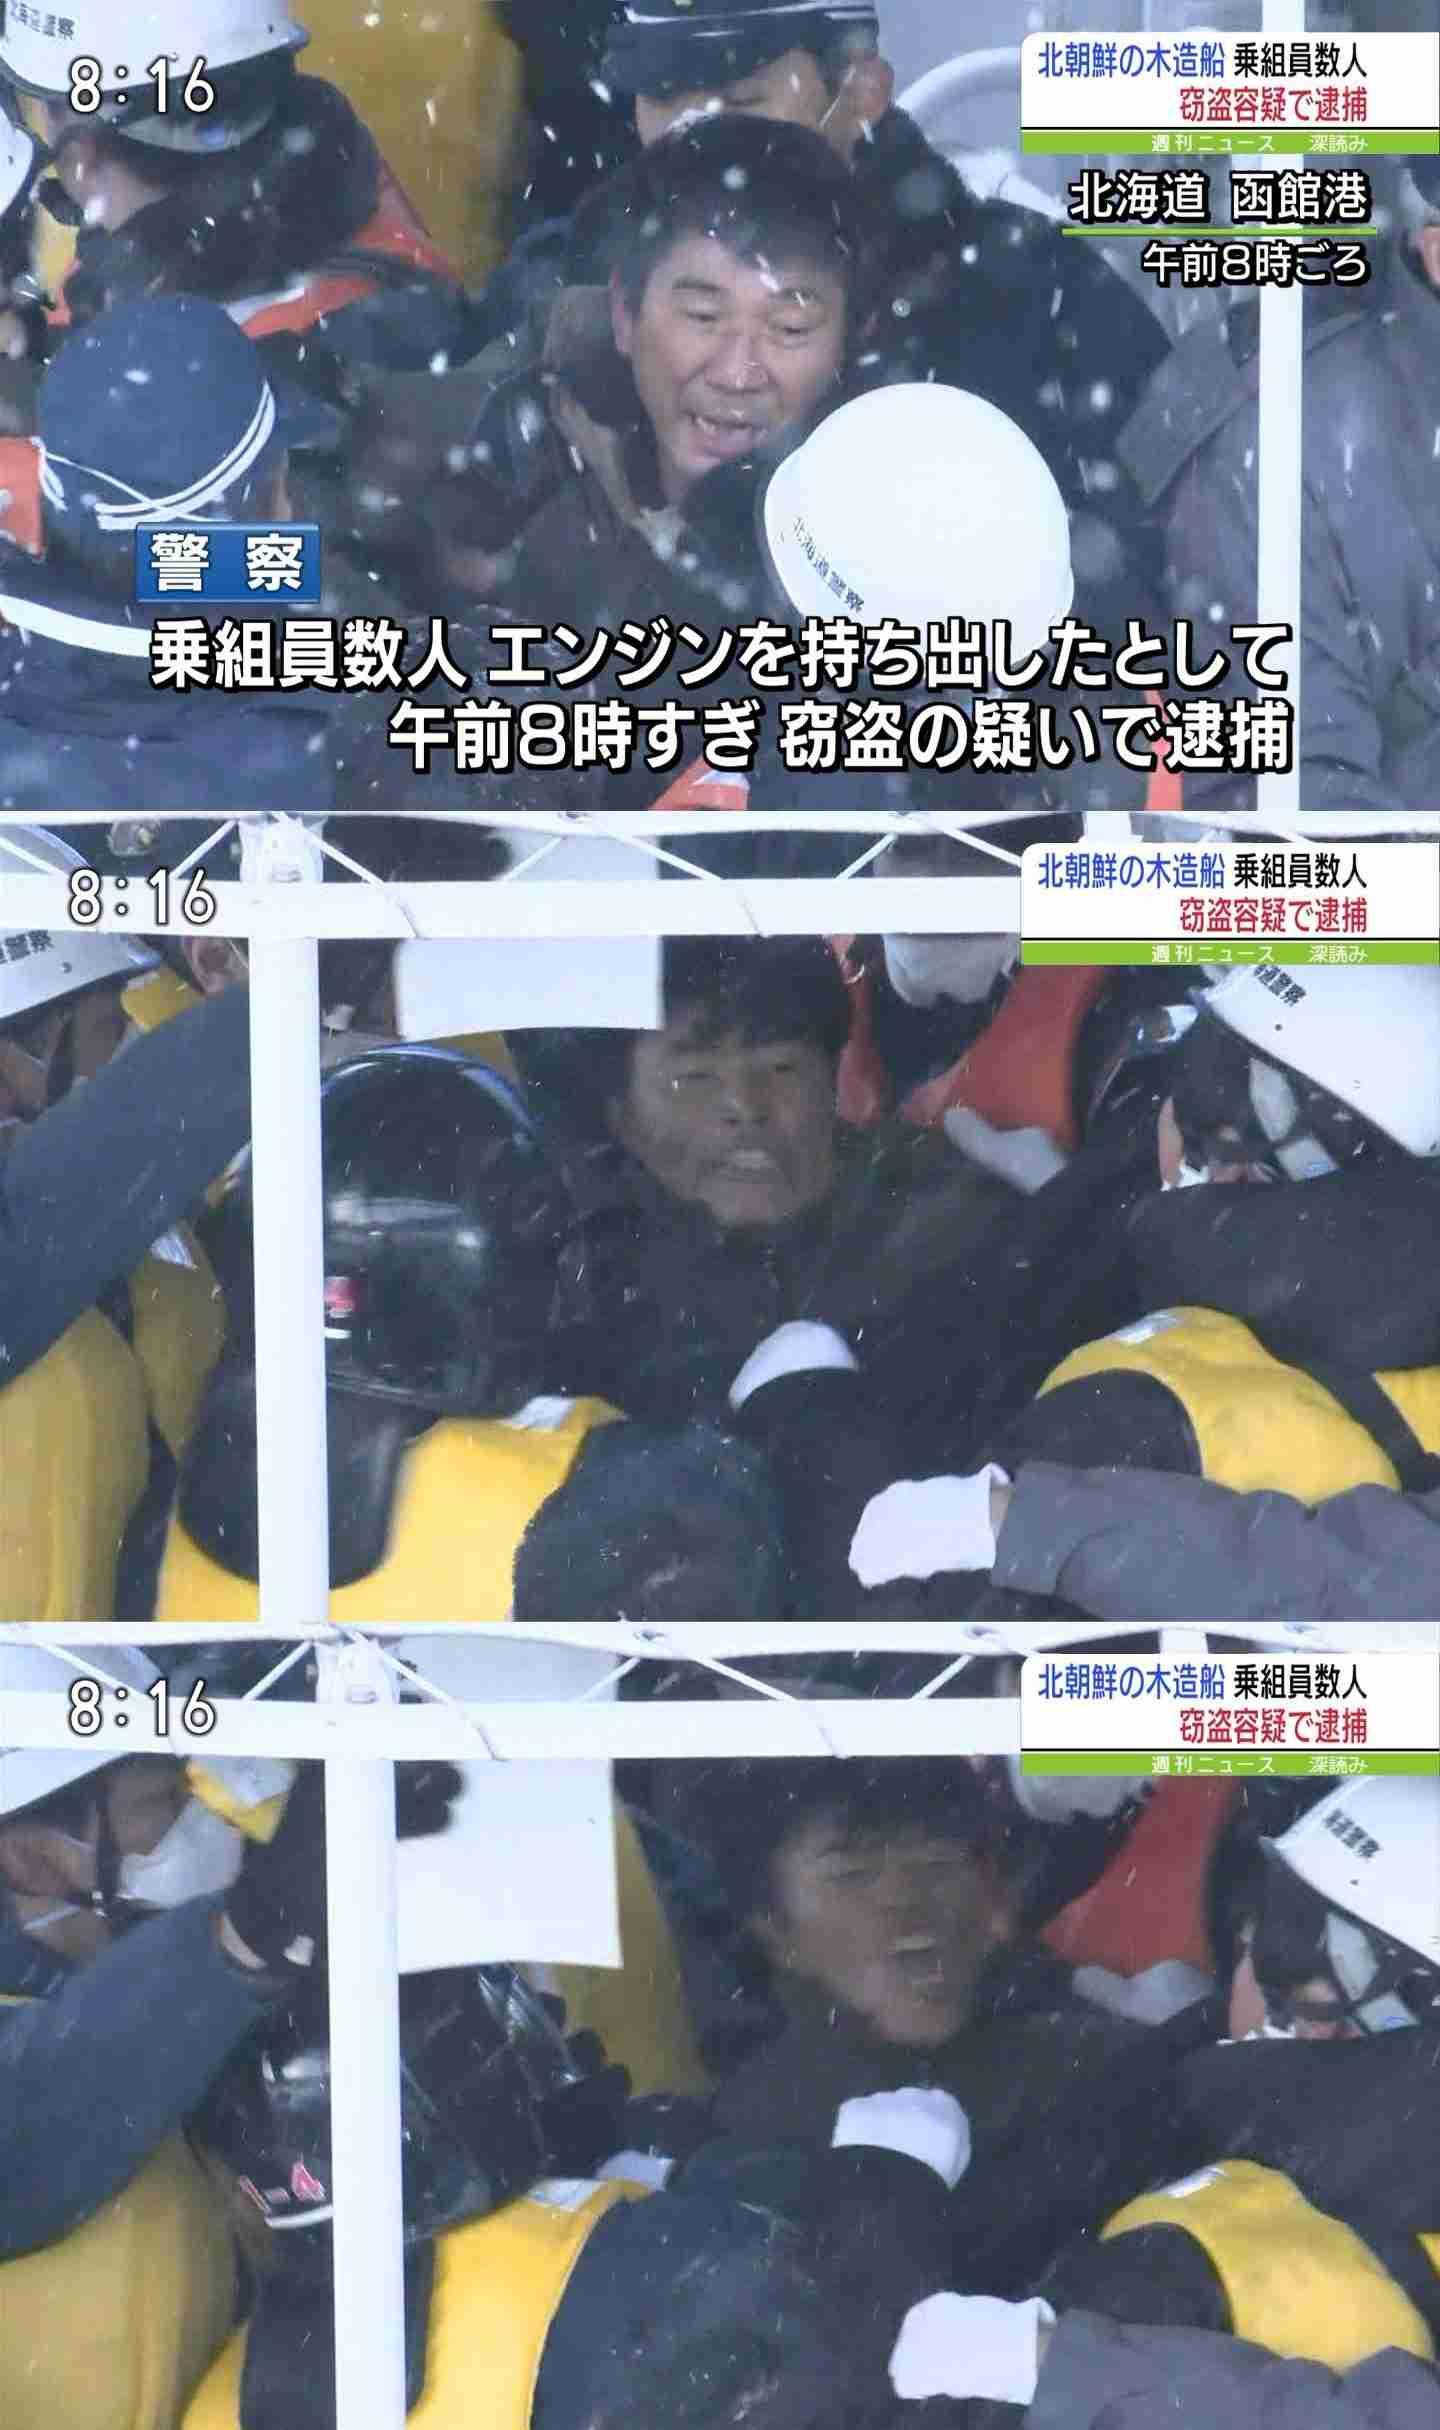 窃盗容疑で北朝鮮の乗員逮捕へ 無人島の被害800万円 北海道警